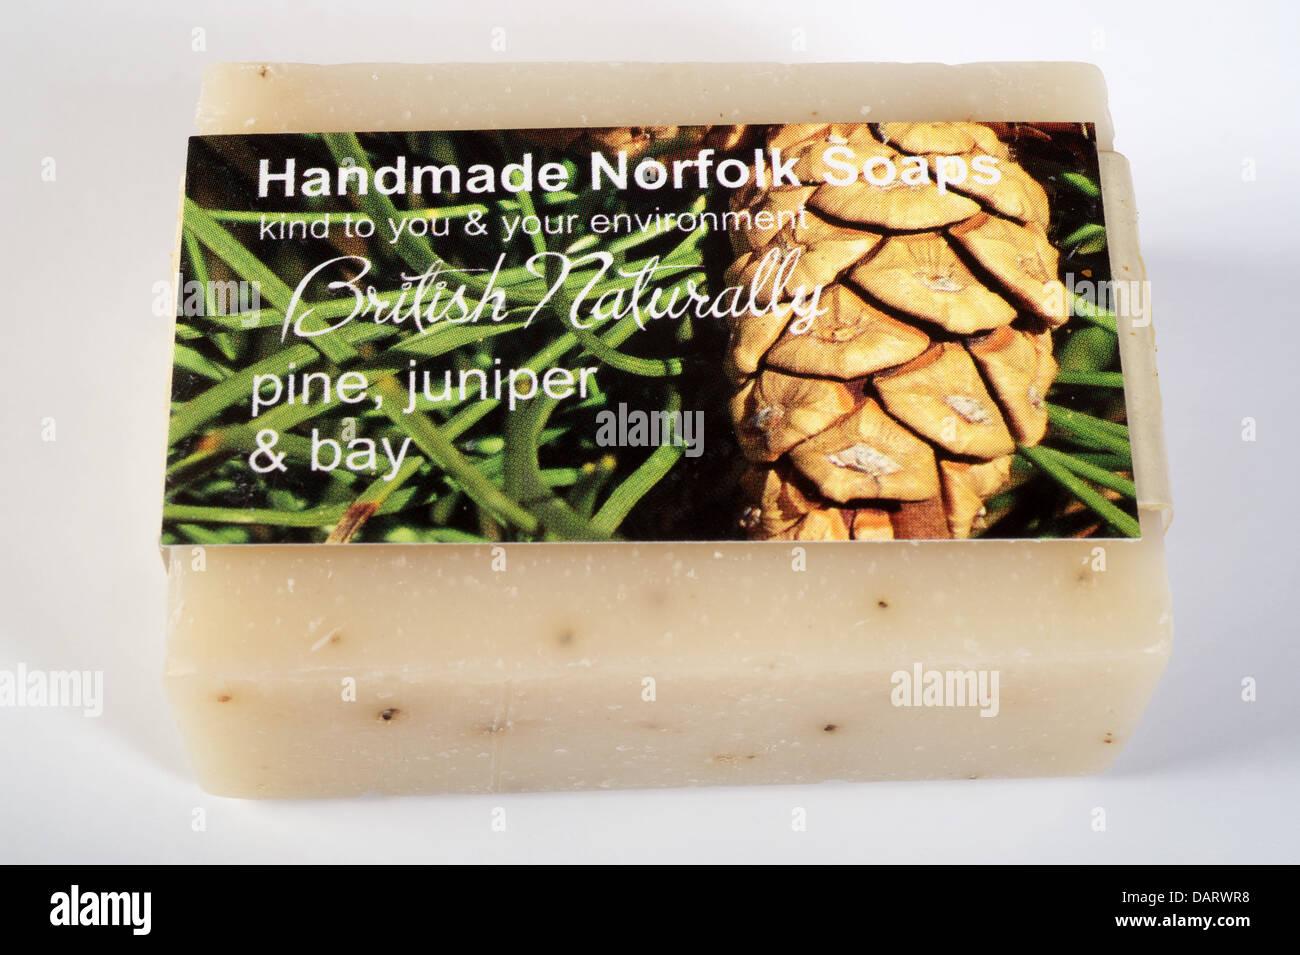 Environmentally friendly handmade Norfolk soap - Stock Image